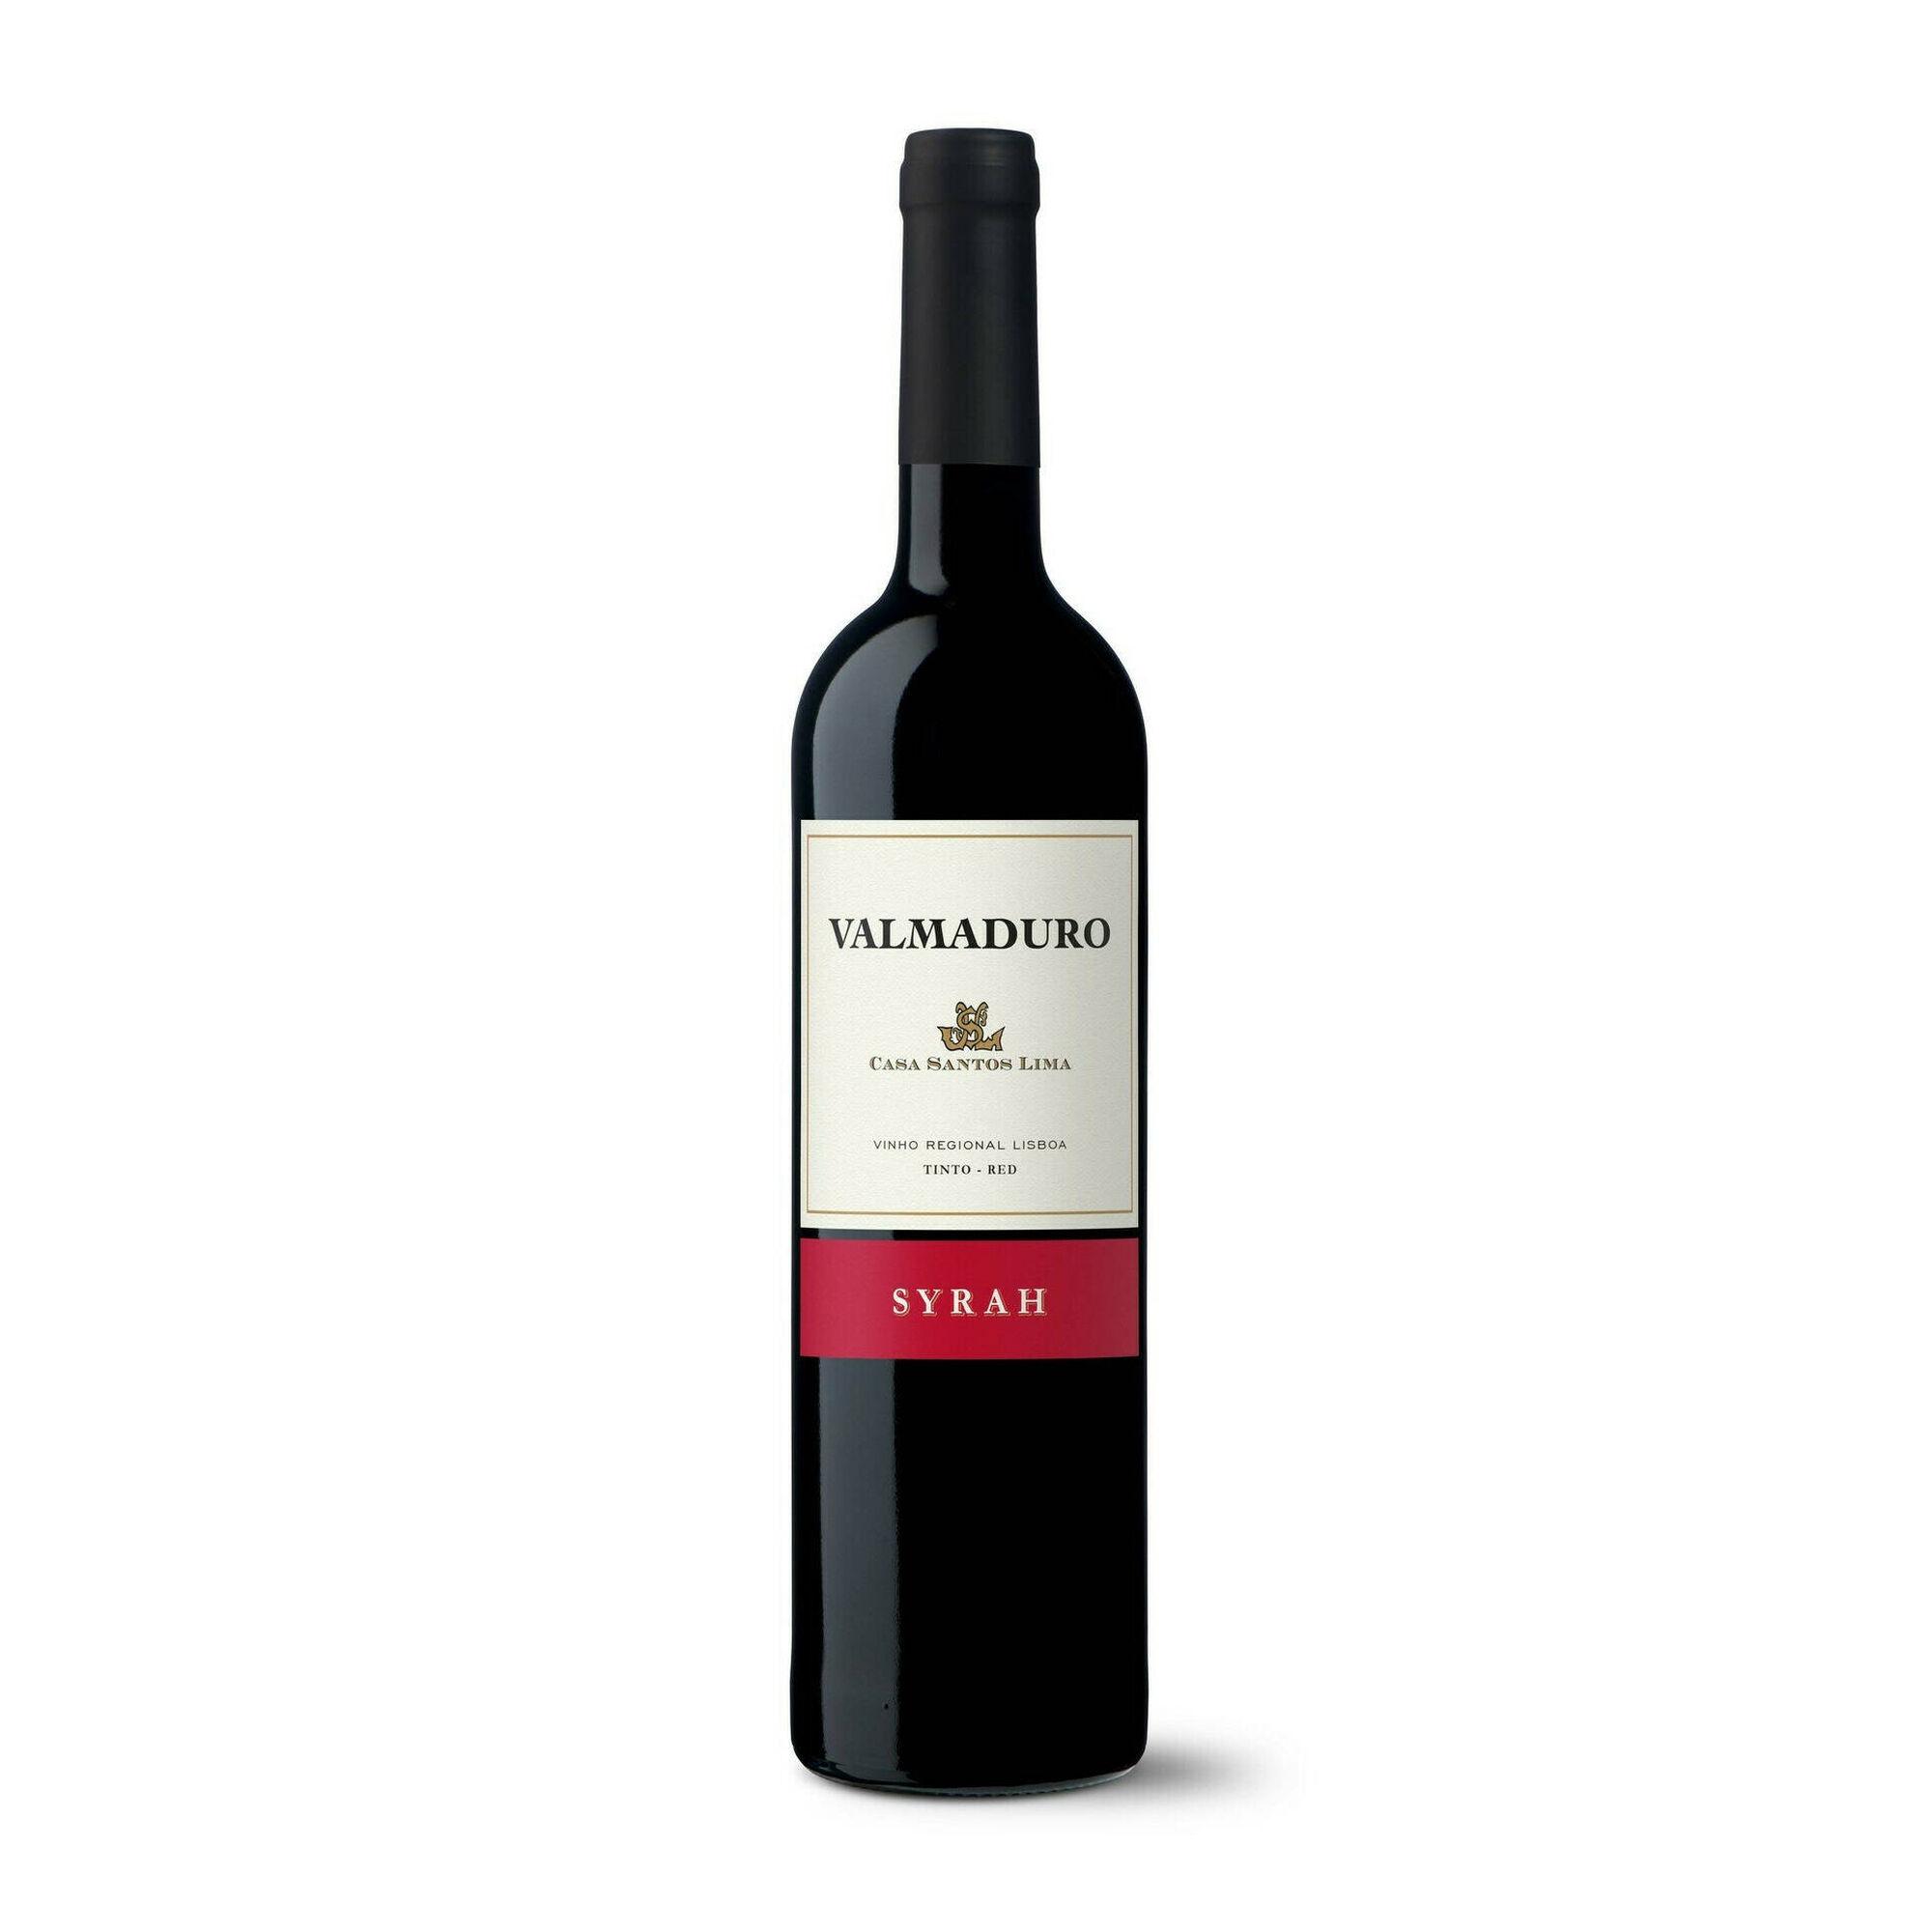 Valmaduro Syrah Regional Lisboa Vinho Tinto